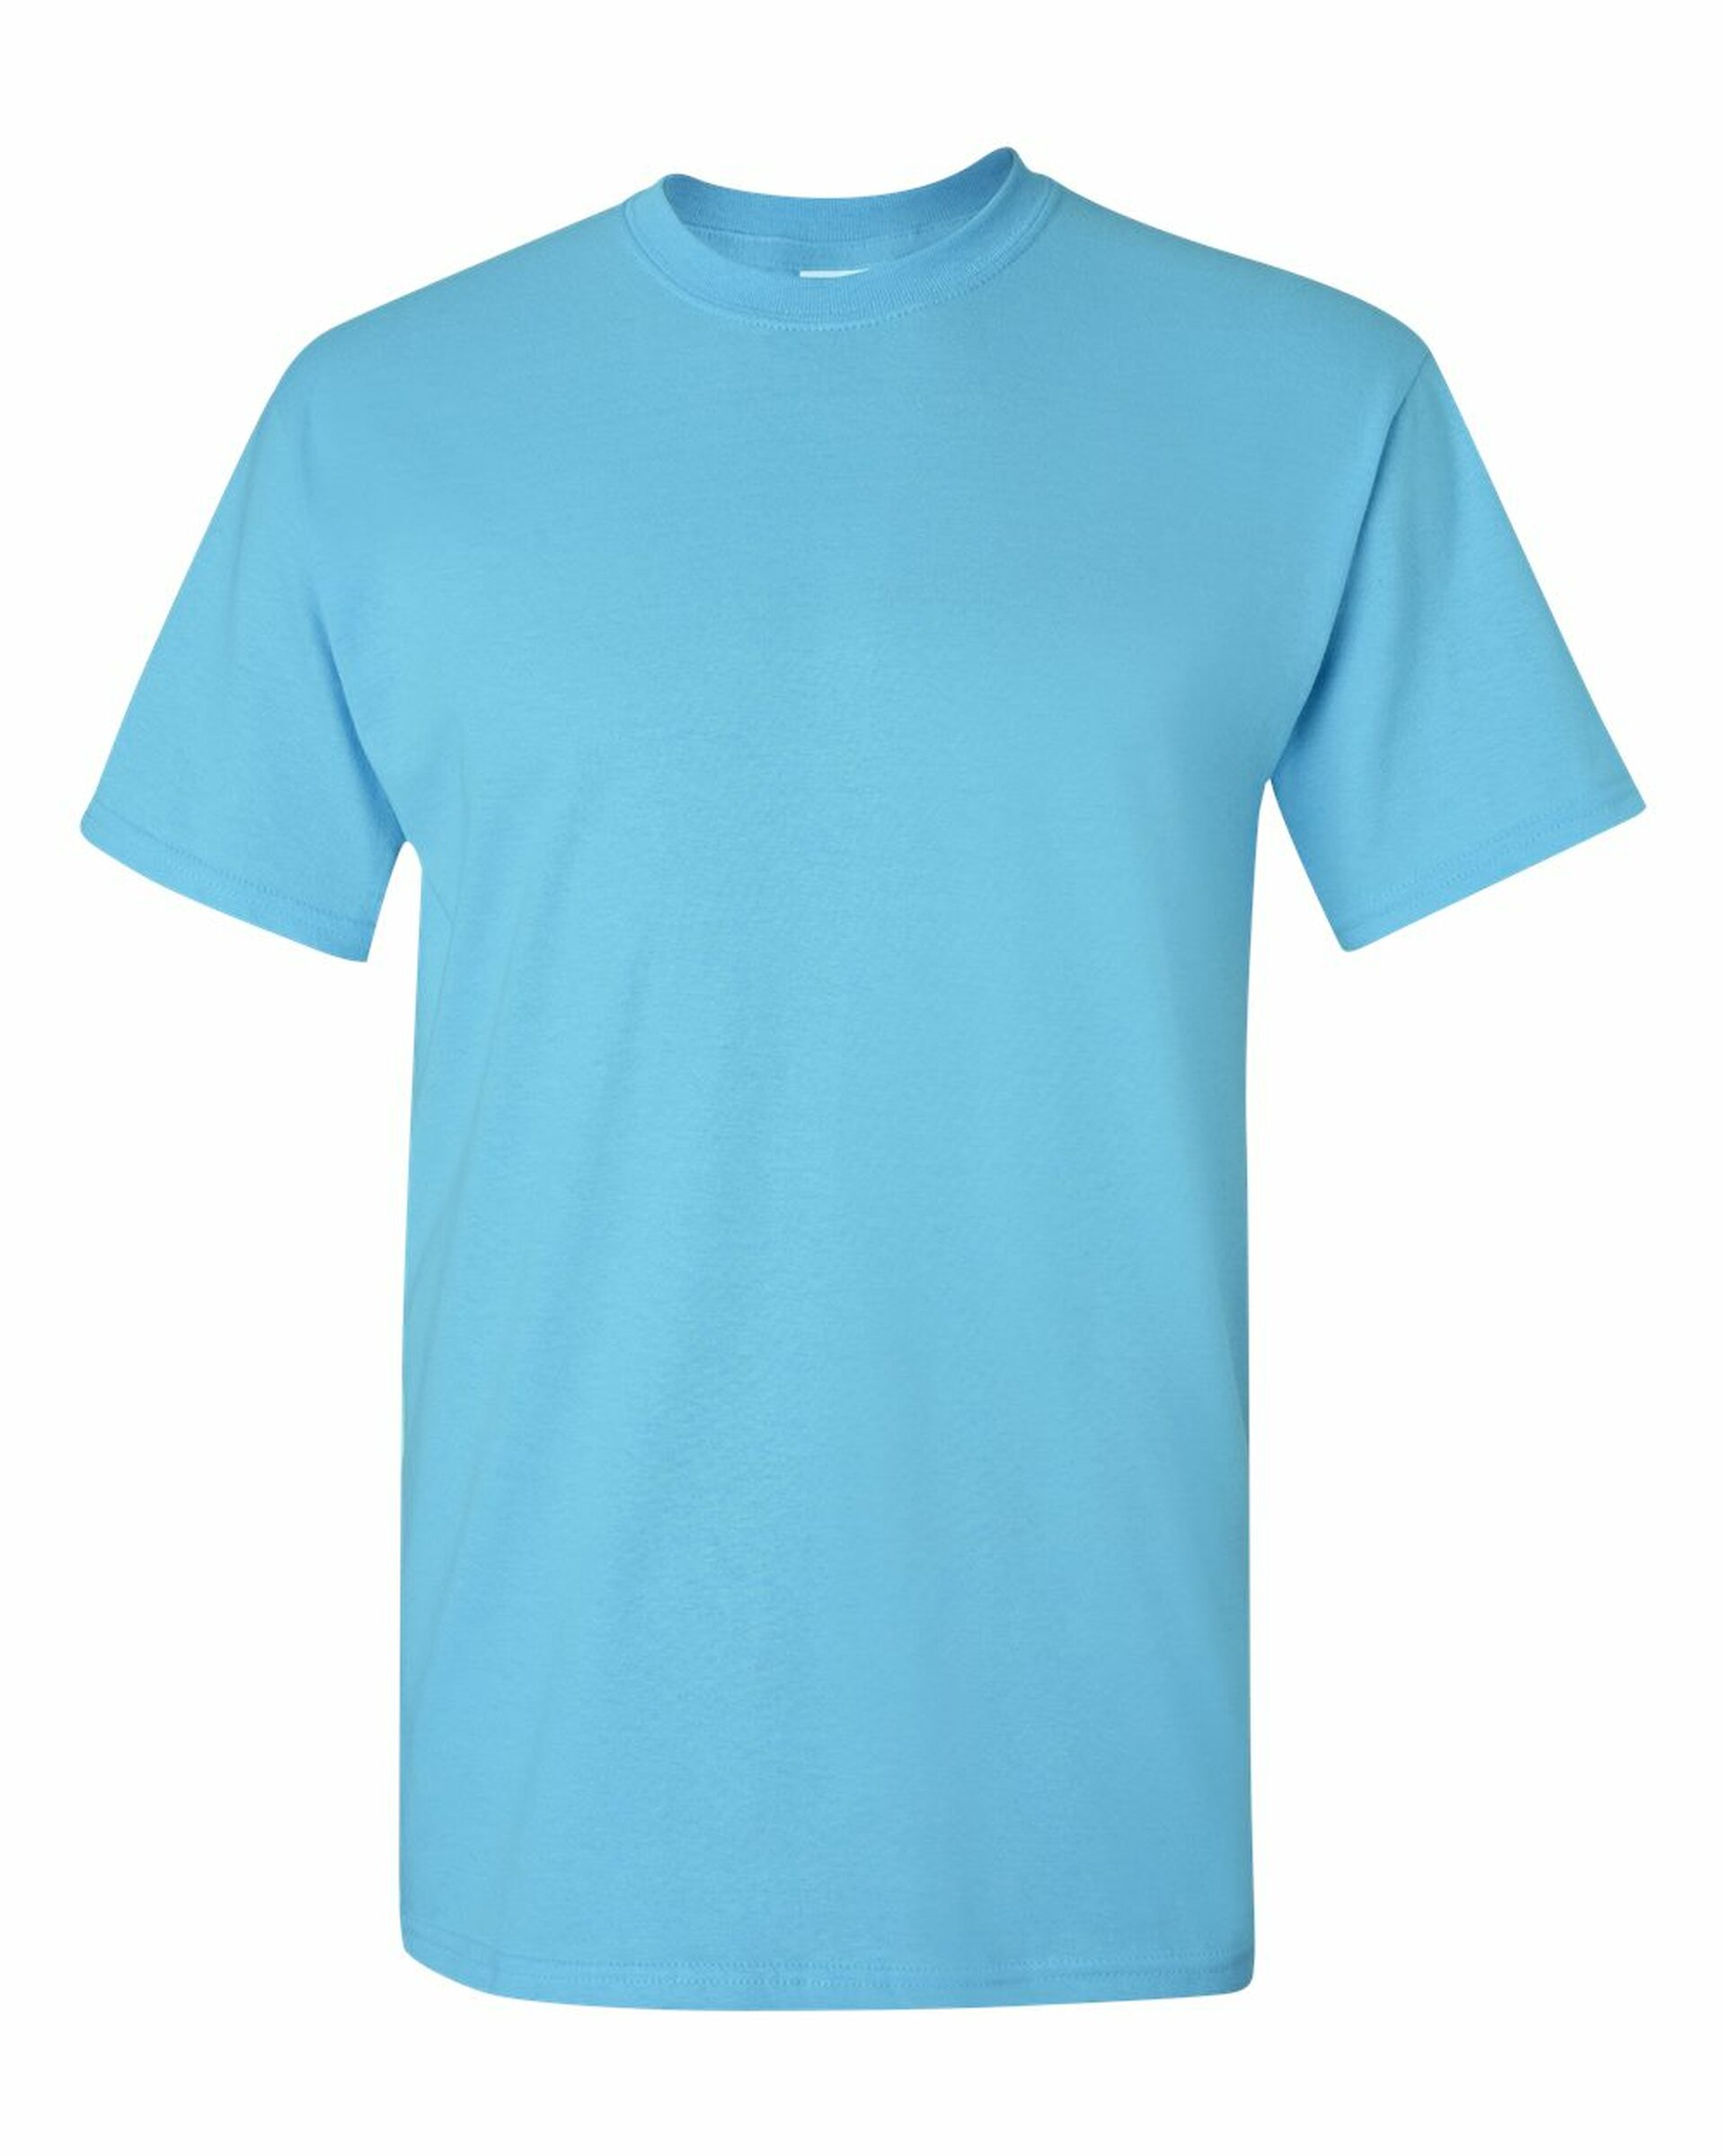 5000 Gildan Heavy Cotton T-Shirt (G500) in Sky